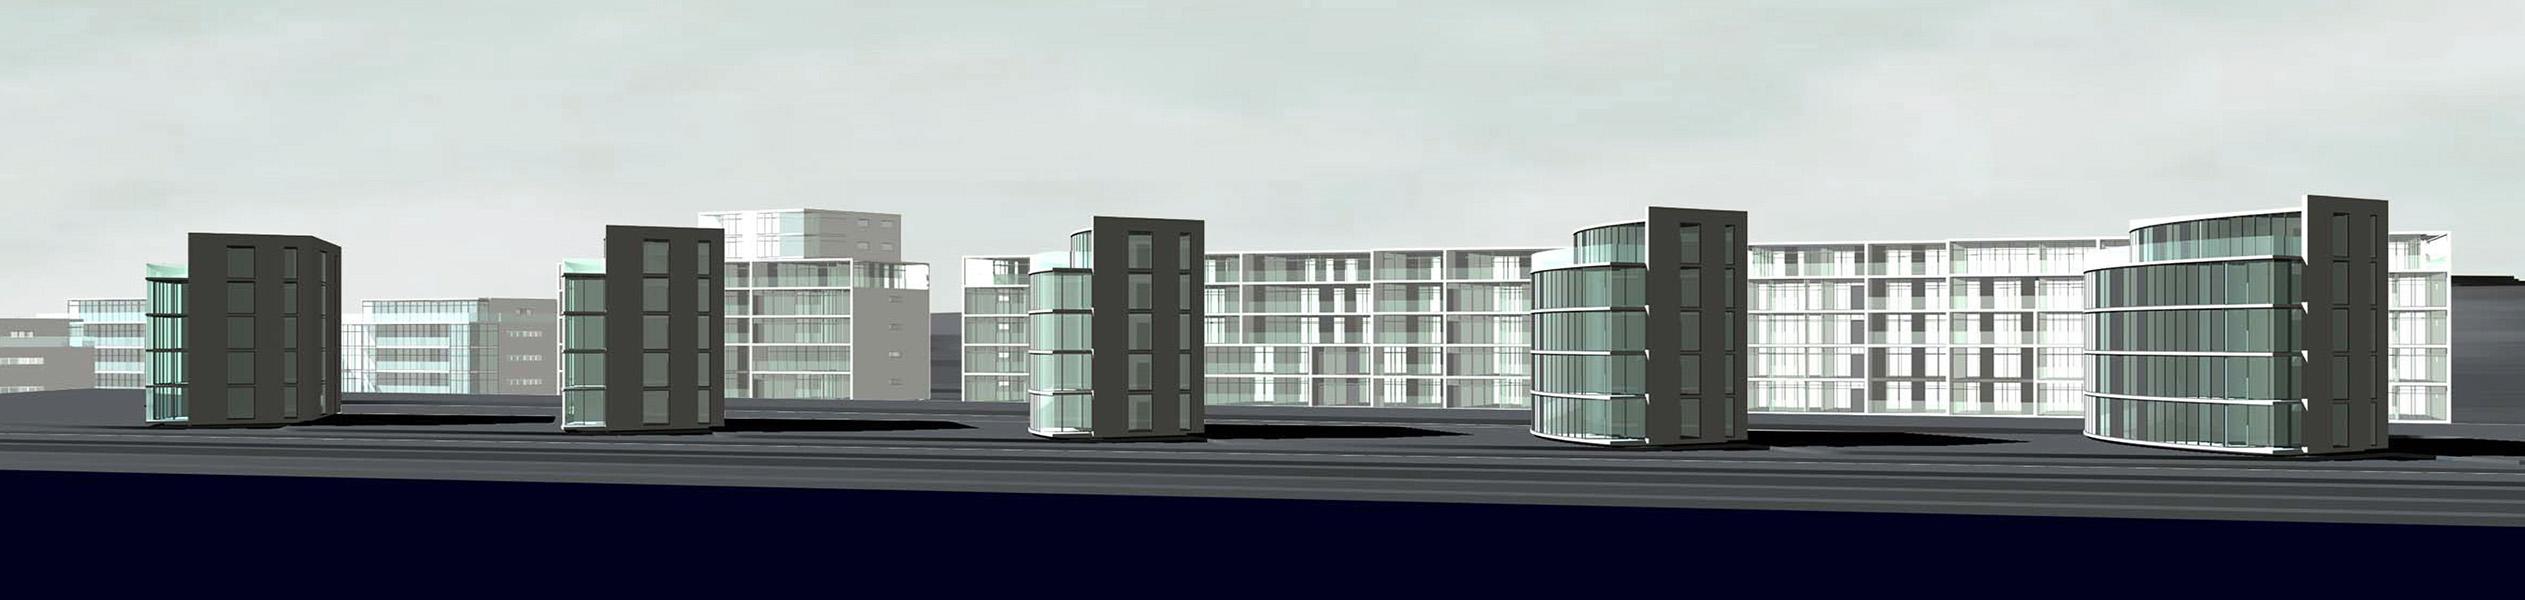 f rdepark kiel architektur martin hecht. Black Bedroom Furniture Sets. Home Design Ideas